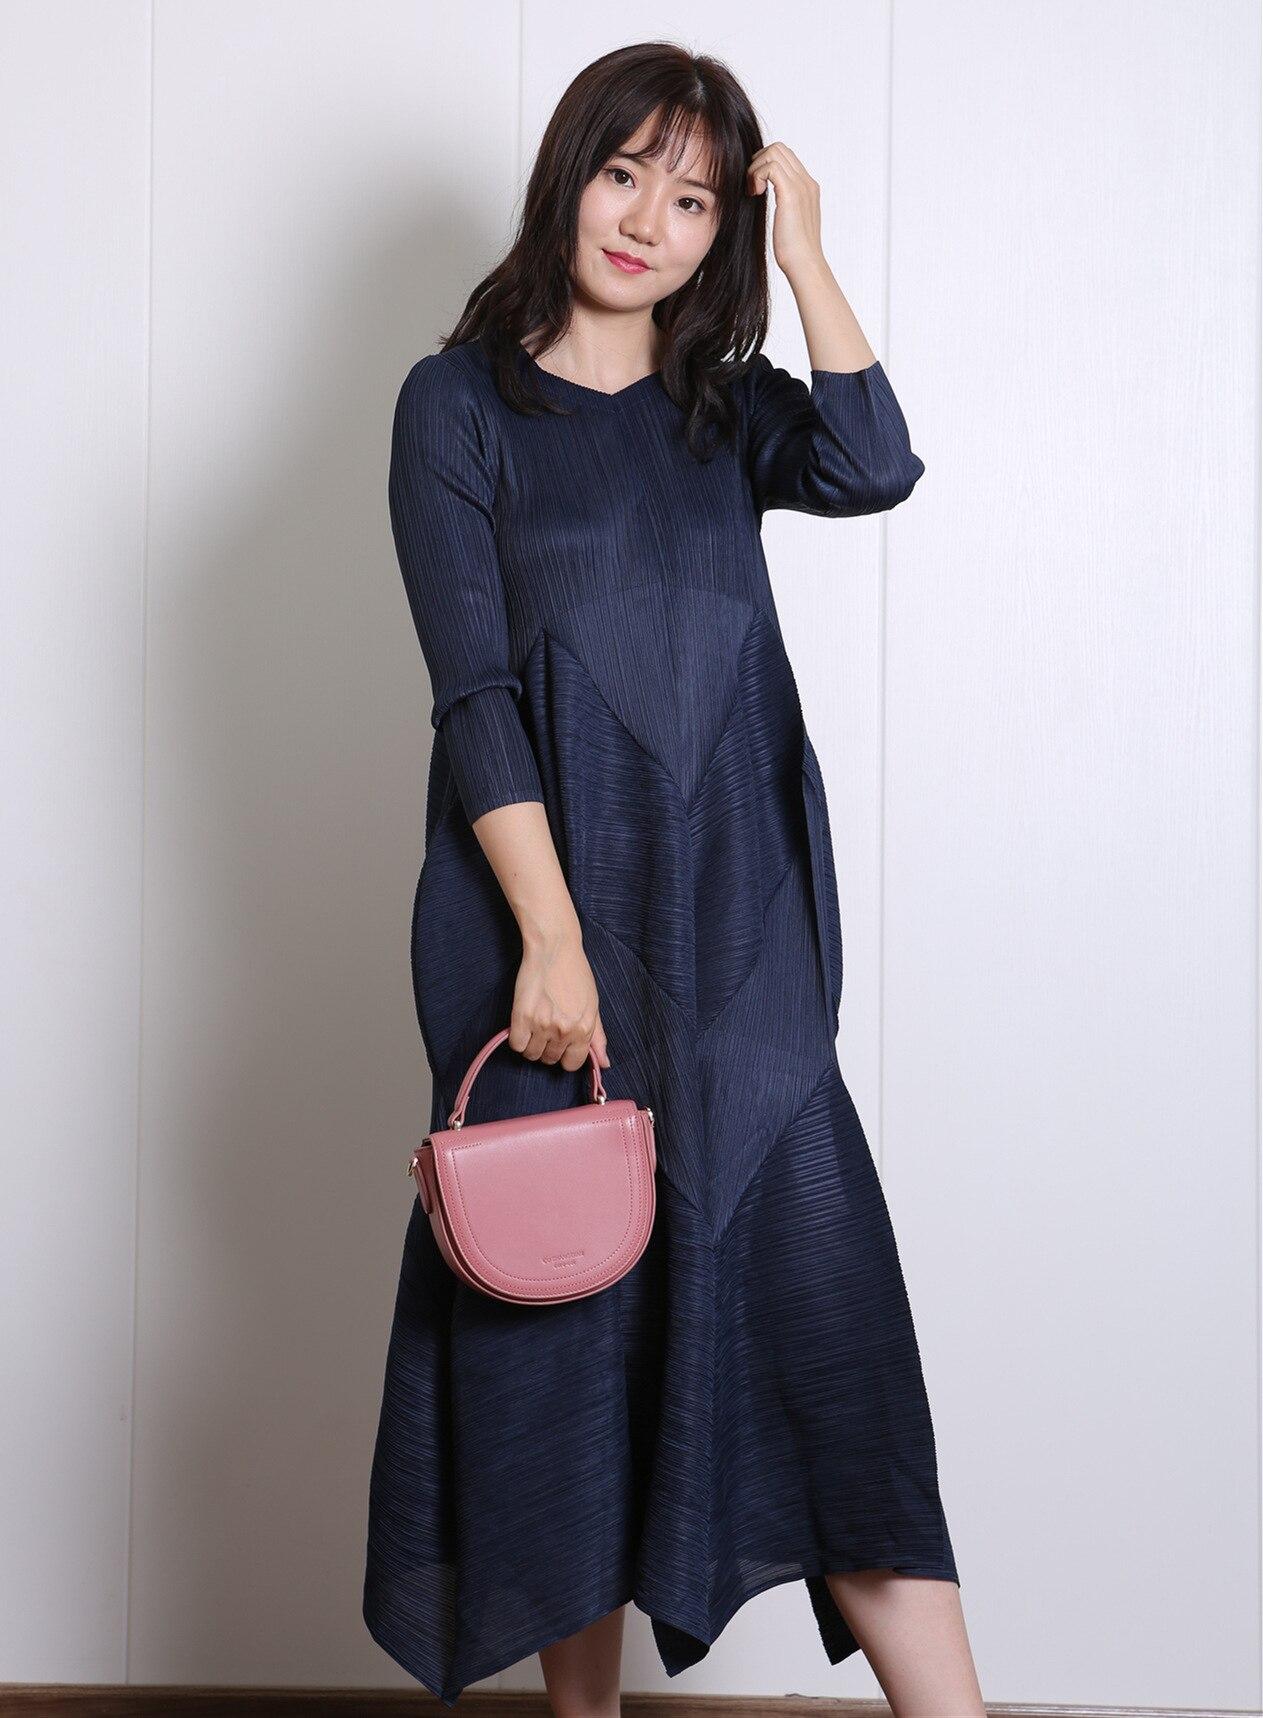 Arrugado moda ajustada manga larga Miyak Pleats vestido cómodo Casual vestido